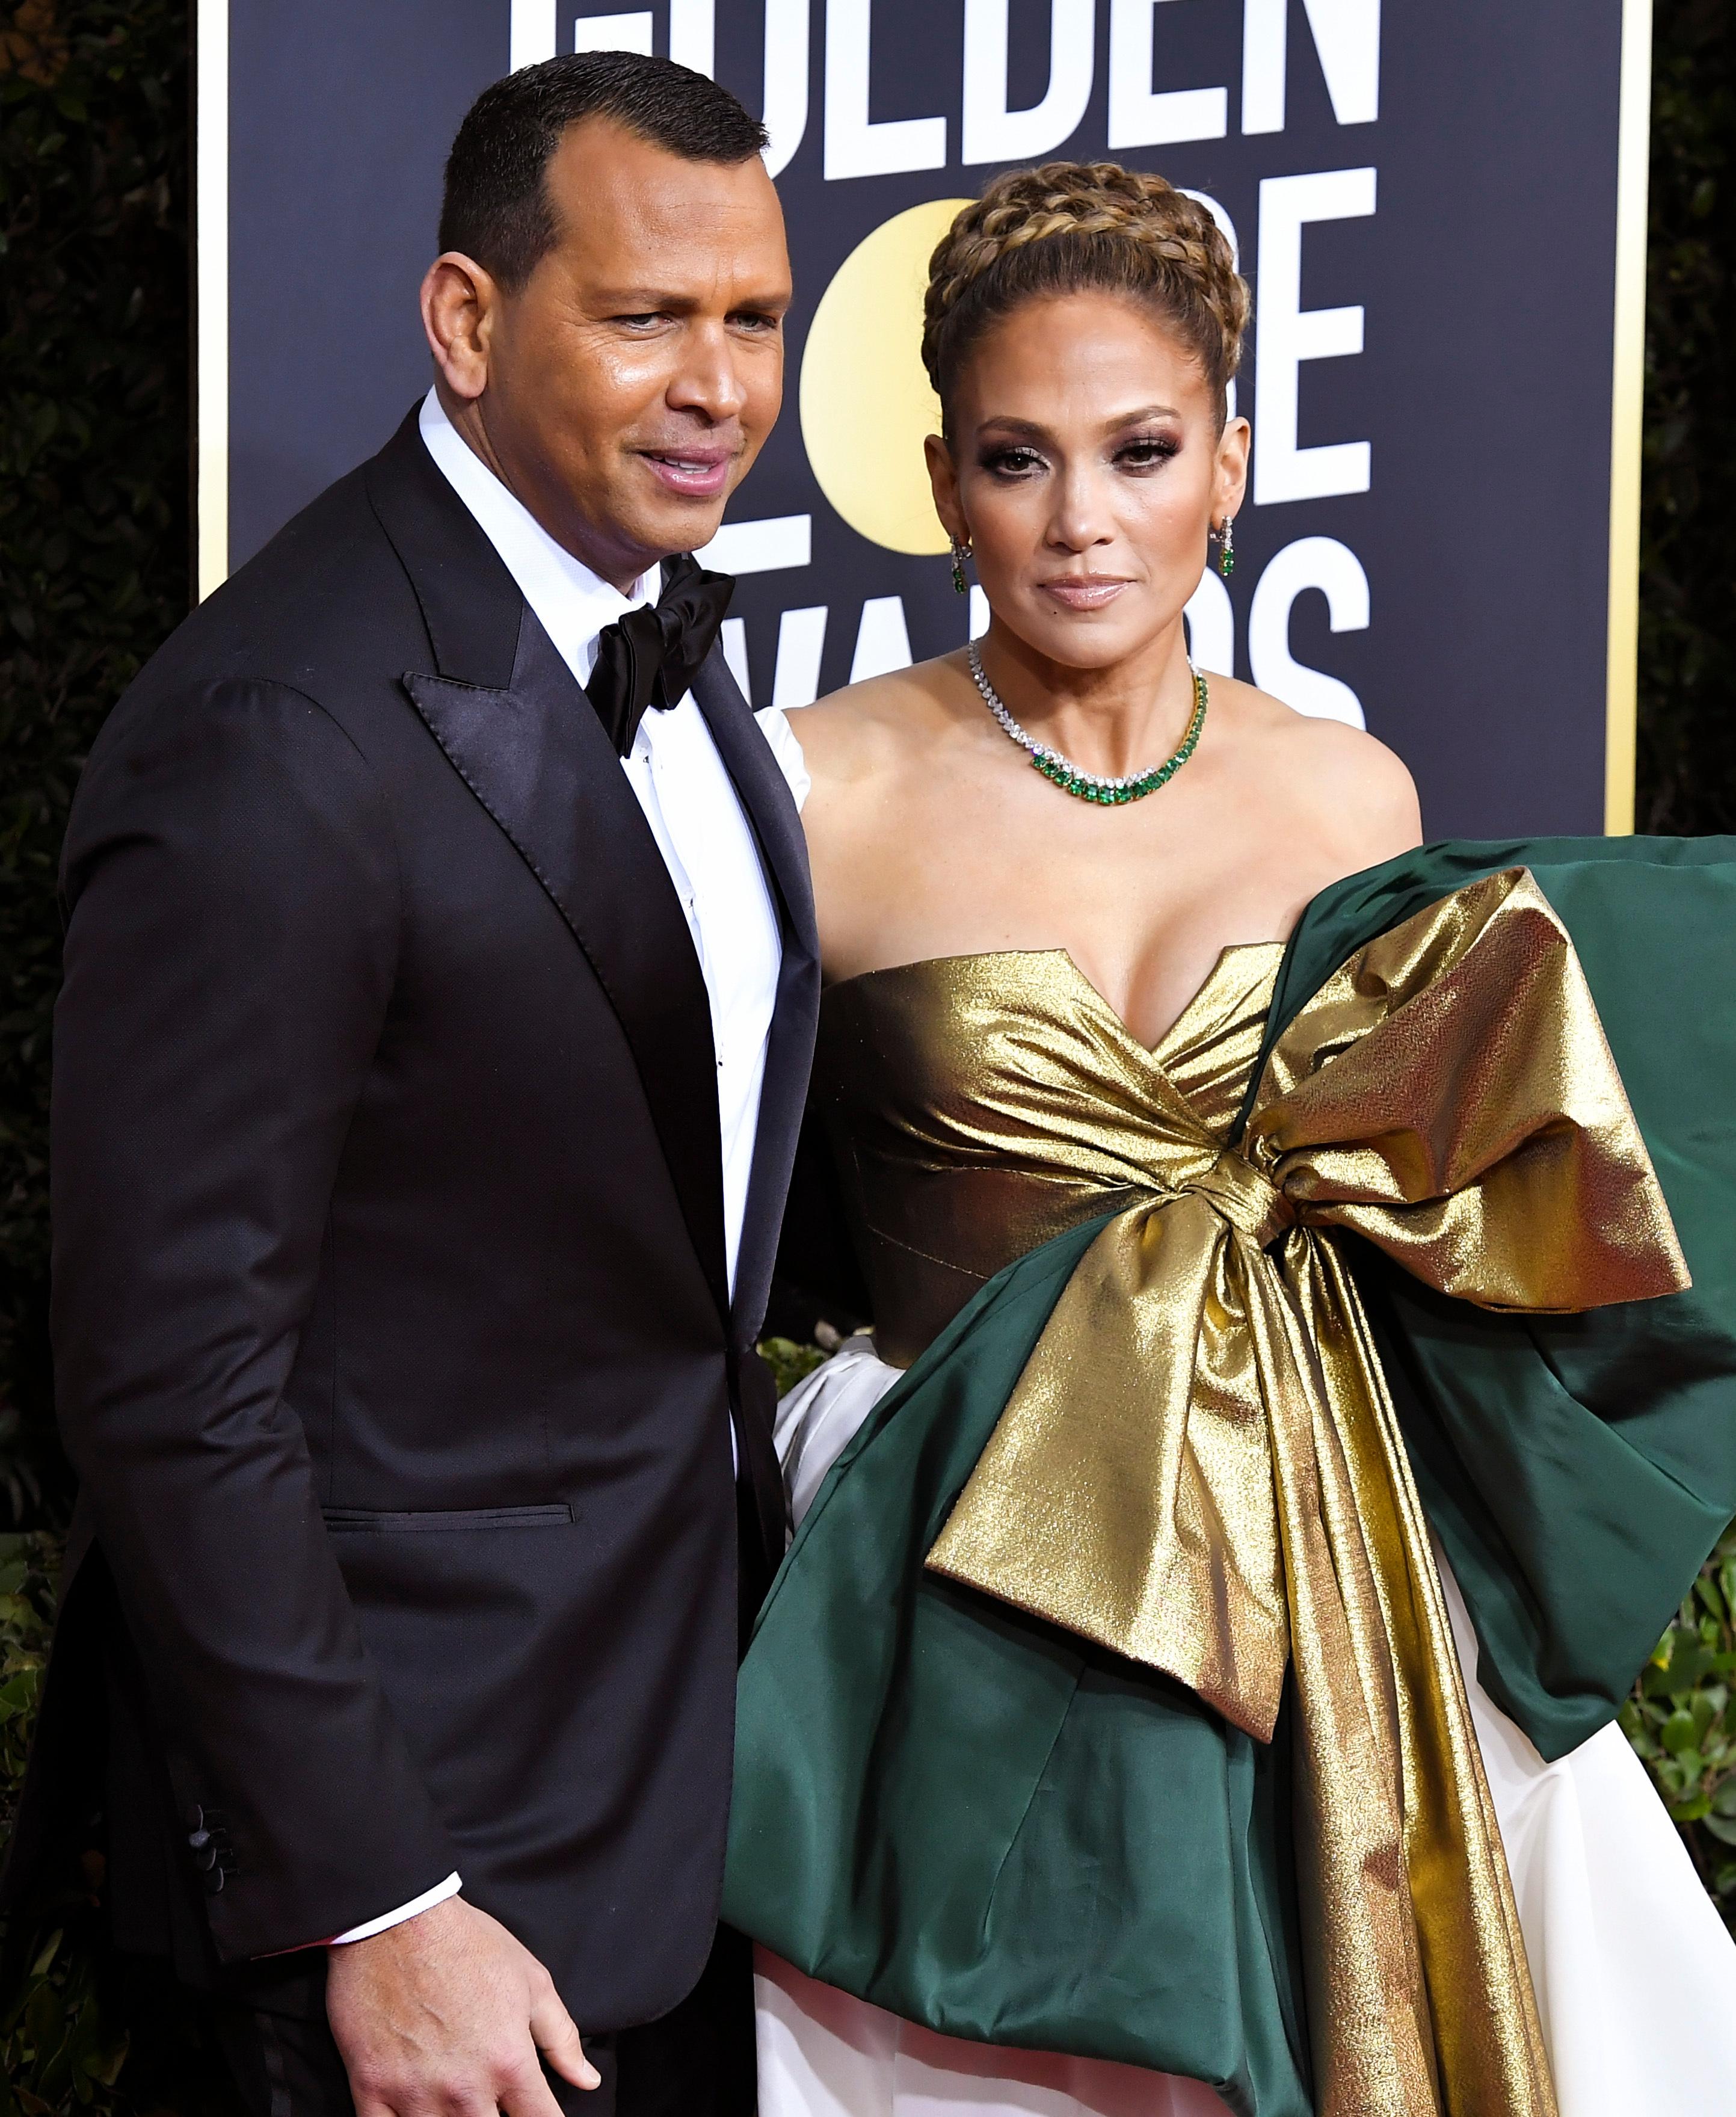 jennifer lopez alex rodriguez golden globes 2020 1 Jennifer Lopezs Golden Globes Dress Is Truly a Gift—Maybe Even Literally